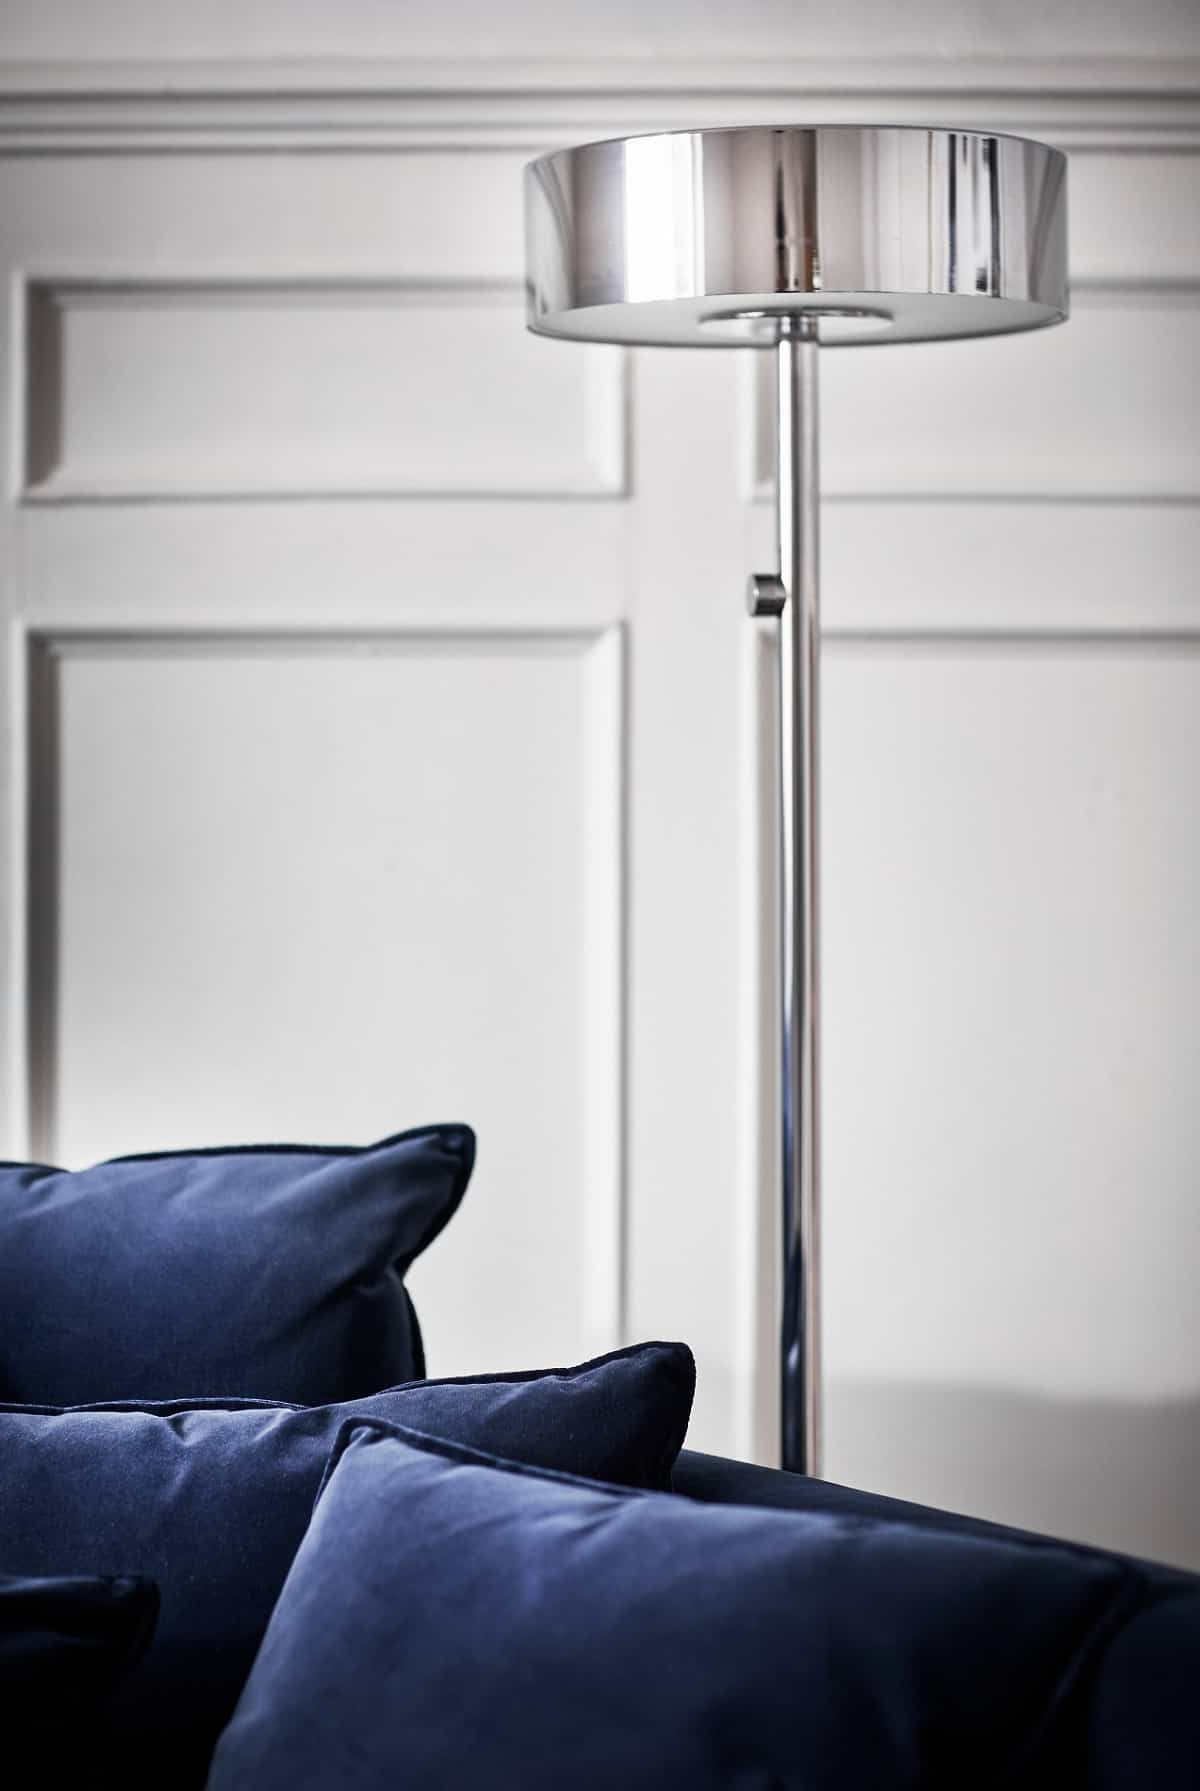 10 lamparas de pie de ikea para decorar tu hogar 5